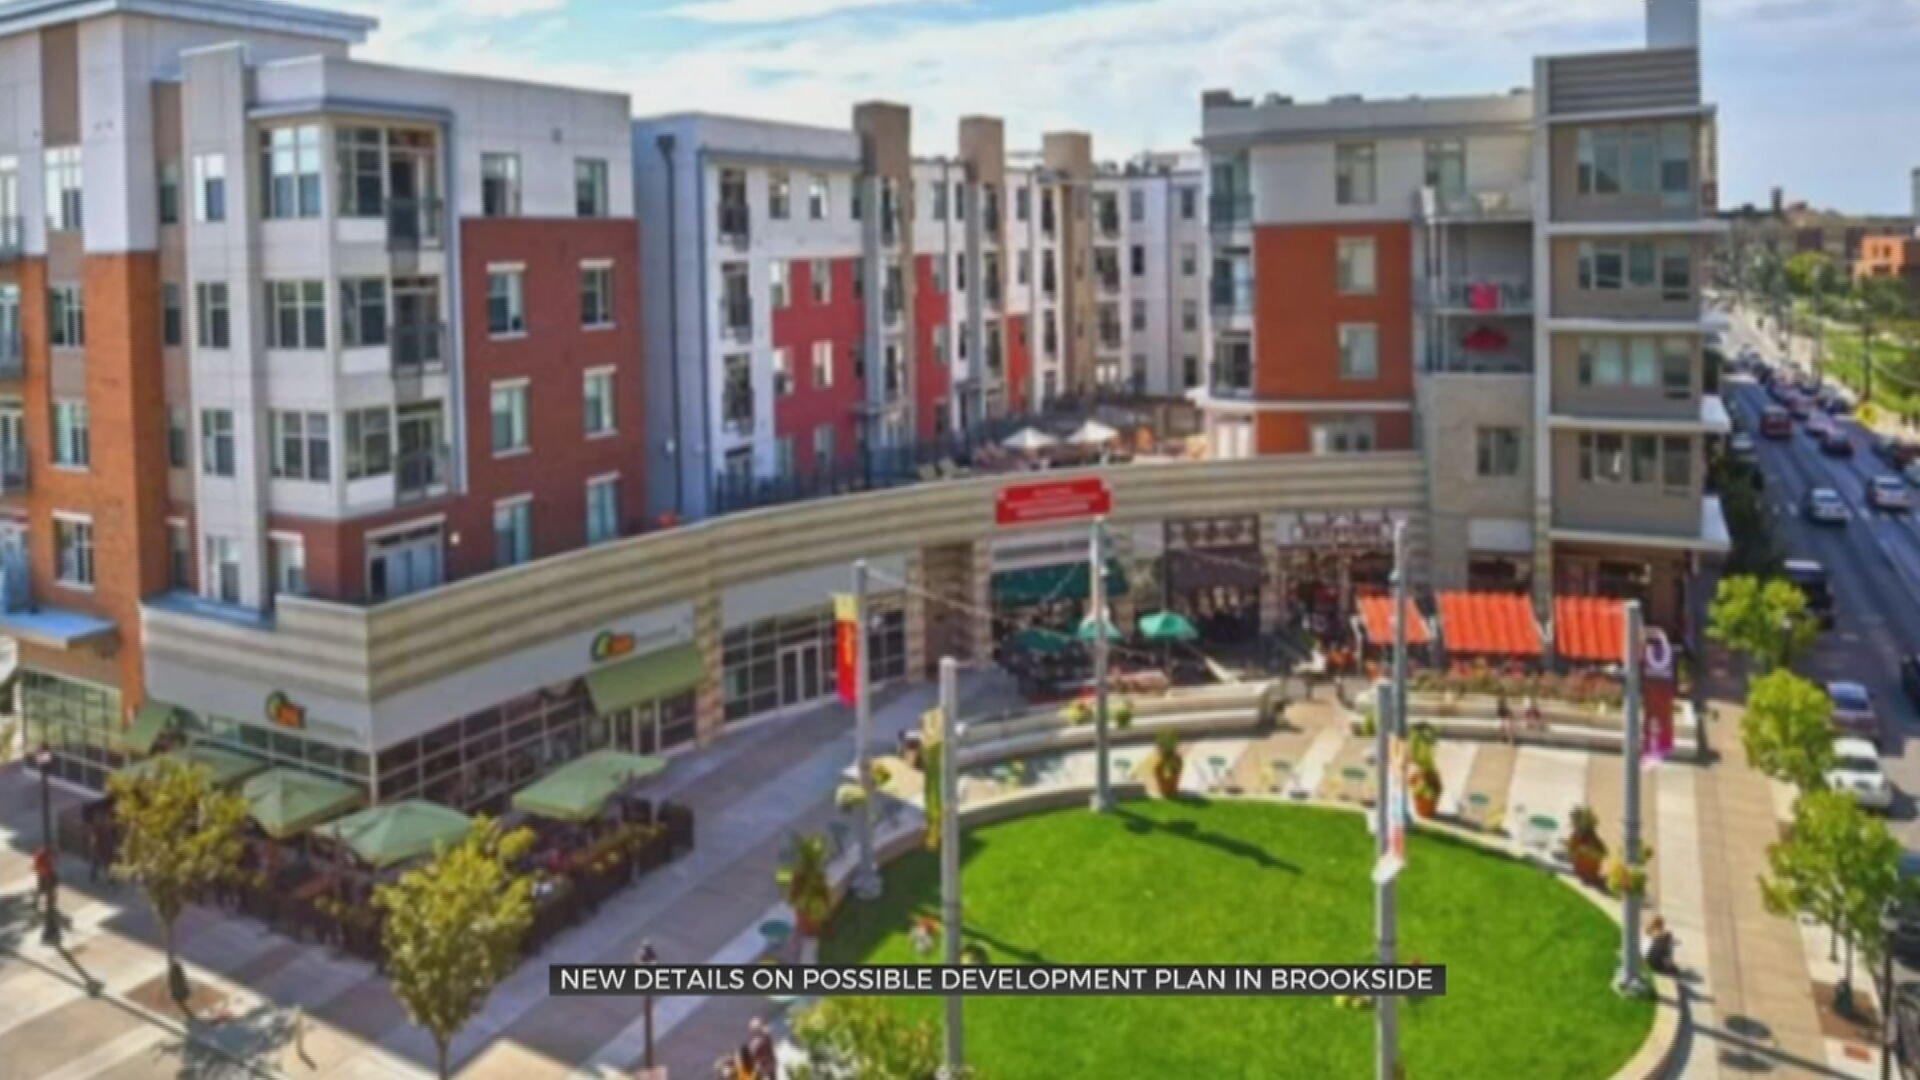 Architecture Firm Discusses Development Plans For Tulsa's Brookside Area